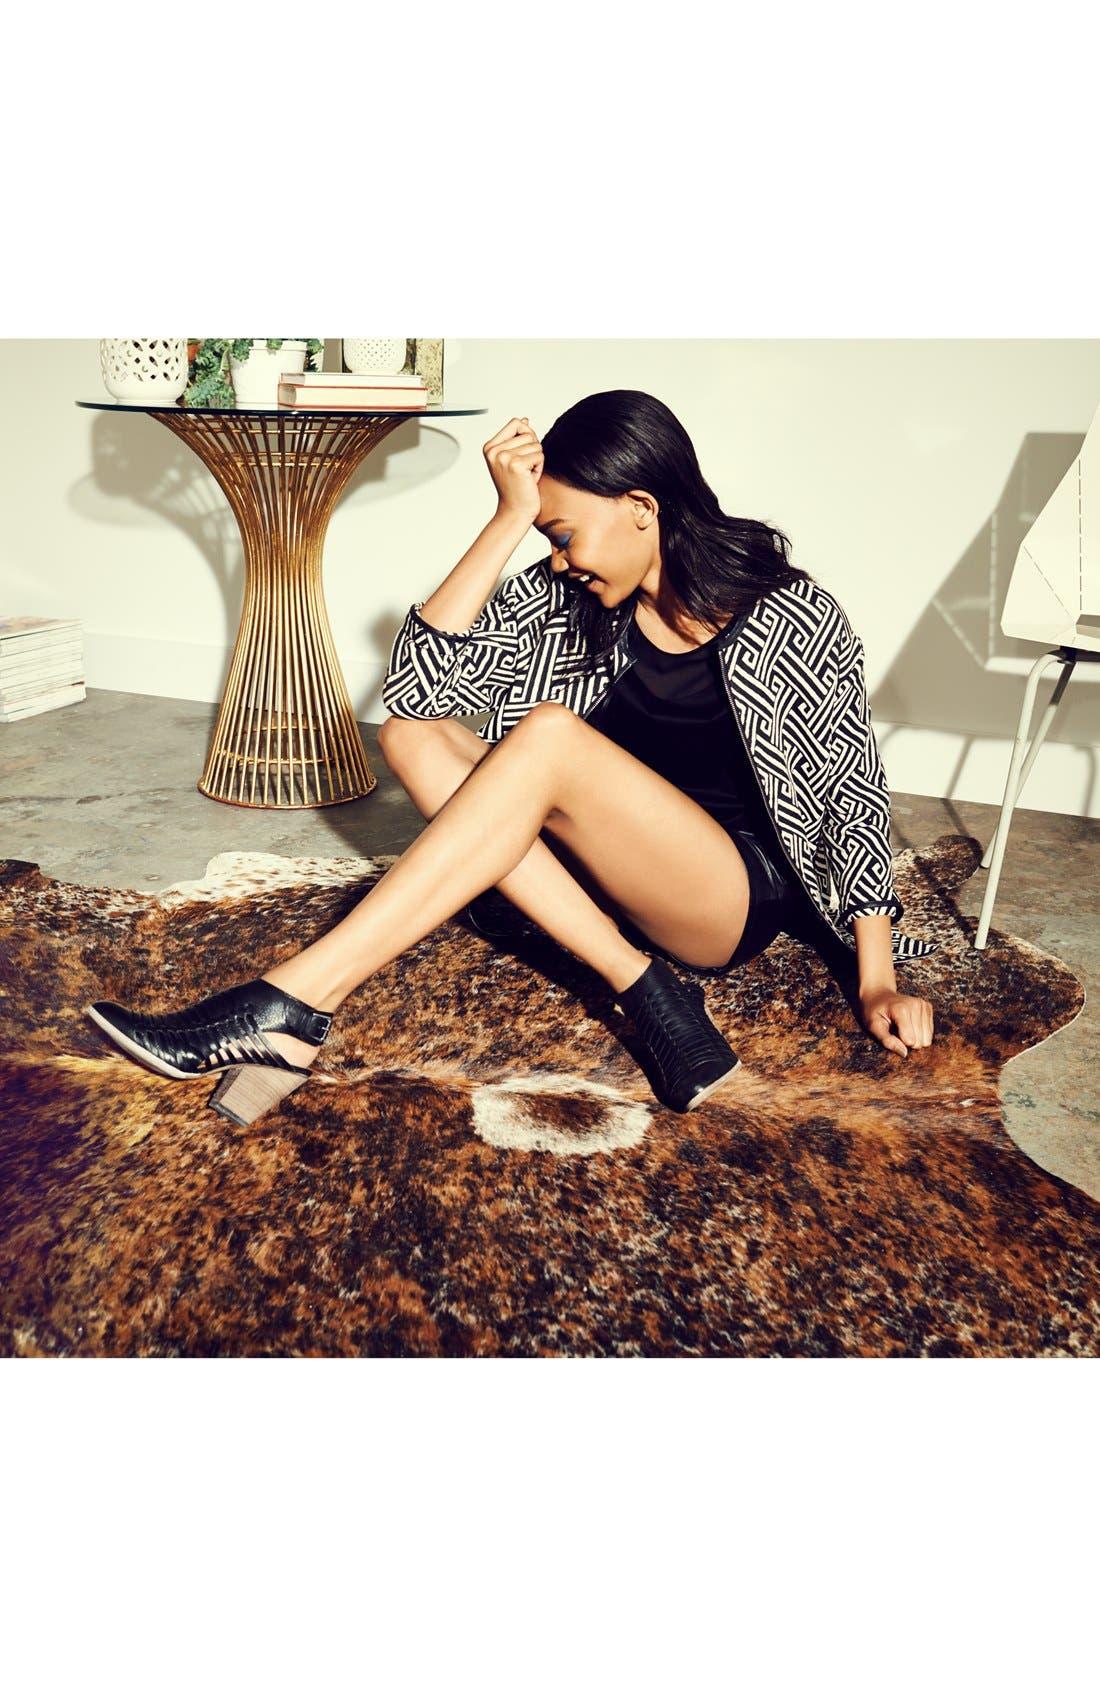 Main Image - Maison Scotch Car Coat, Halogen® Leather Shorts & Dolce Vita 'Harolyn' Bootie